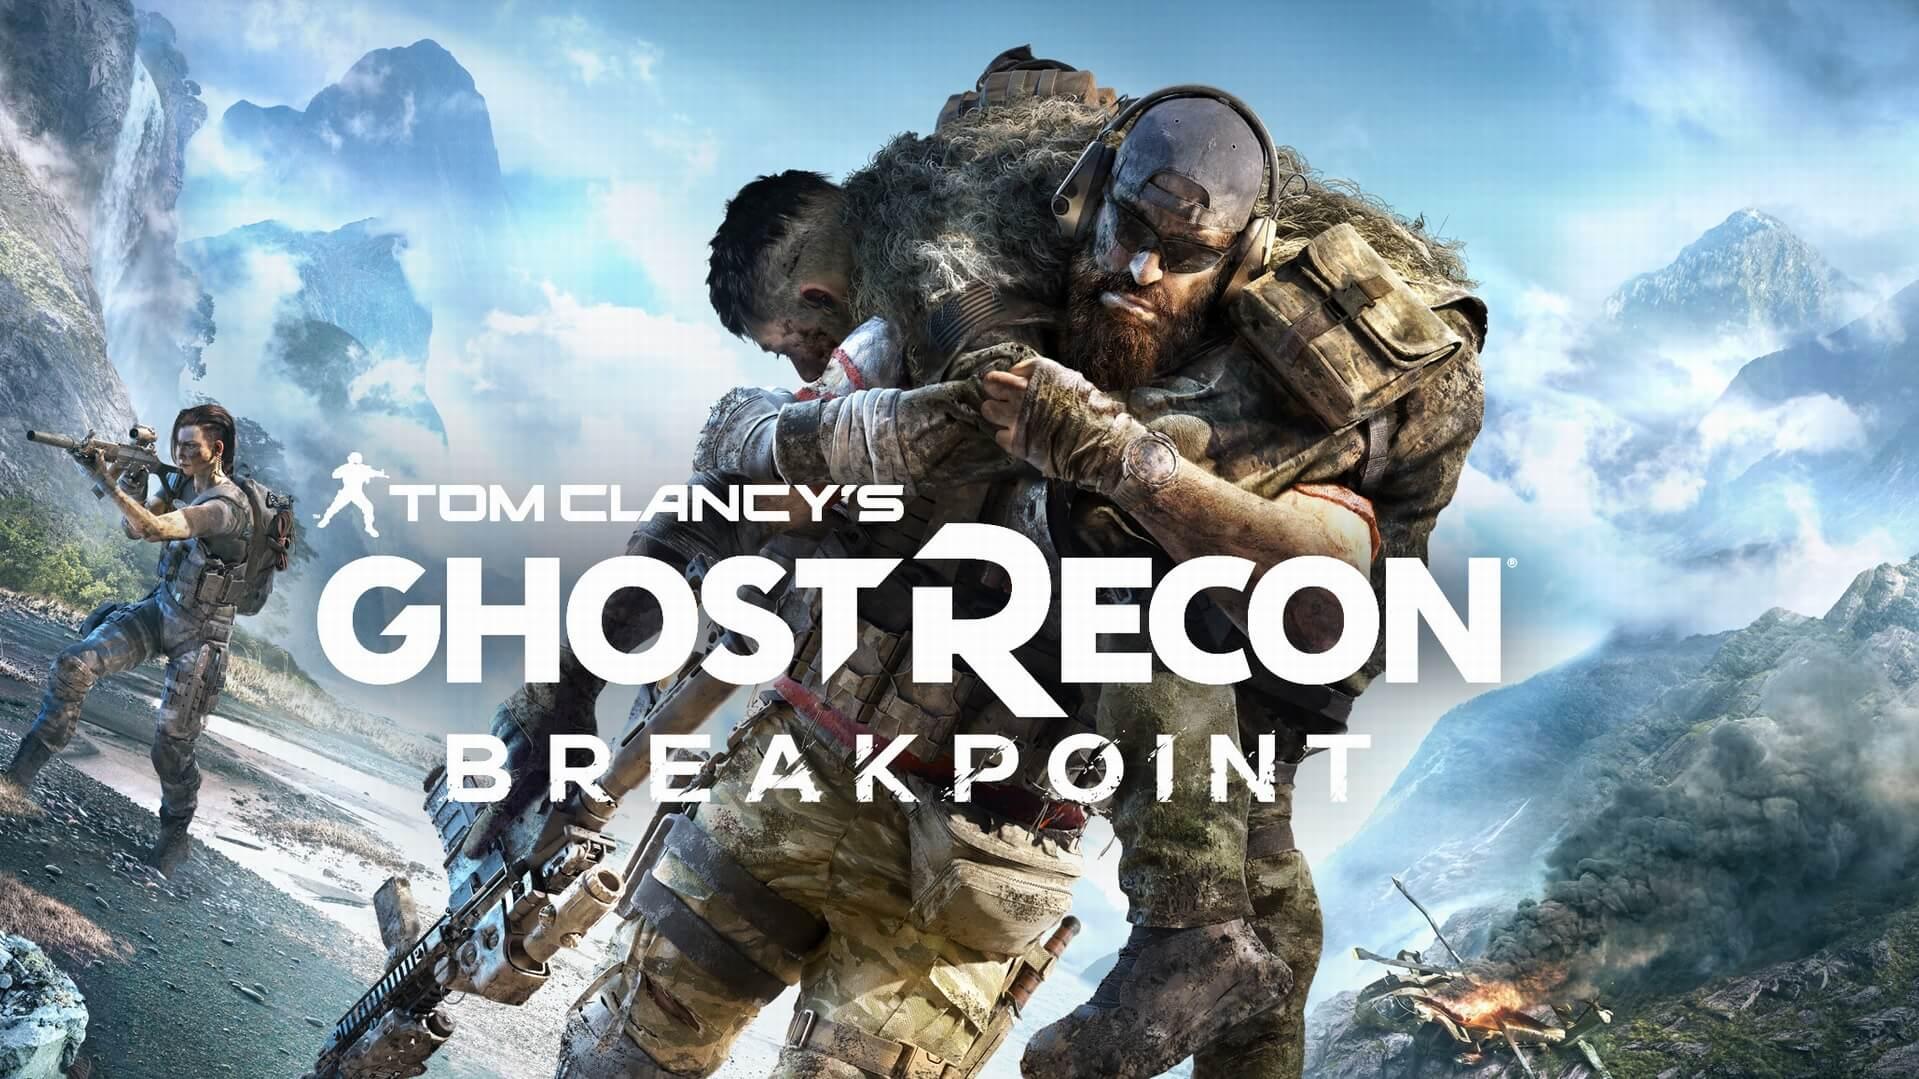 Подробности обновления 2.0.0 для Tom Clancy's Ghost Recon: Breakpoint